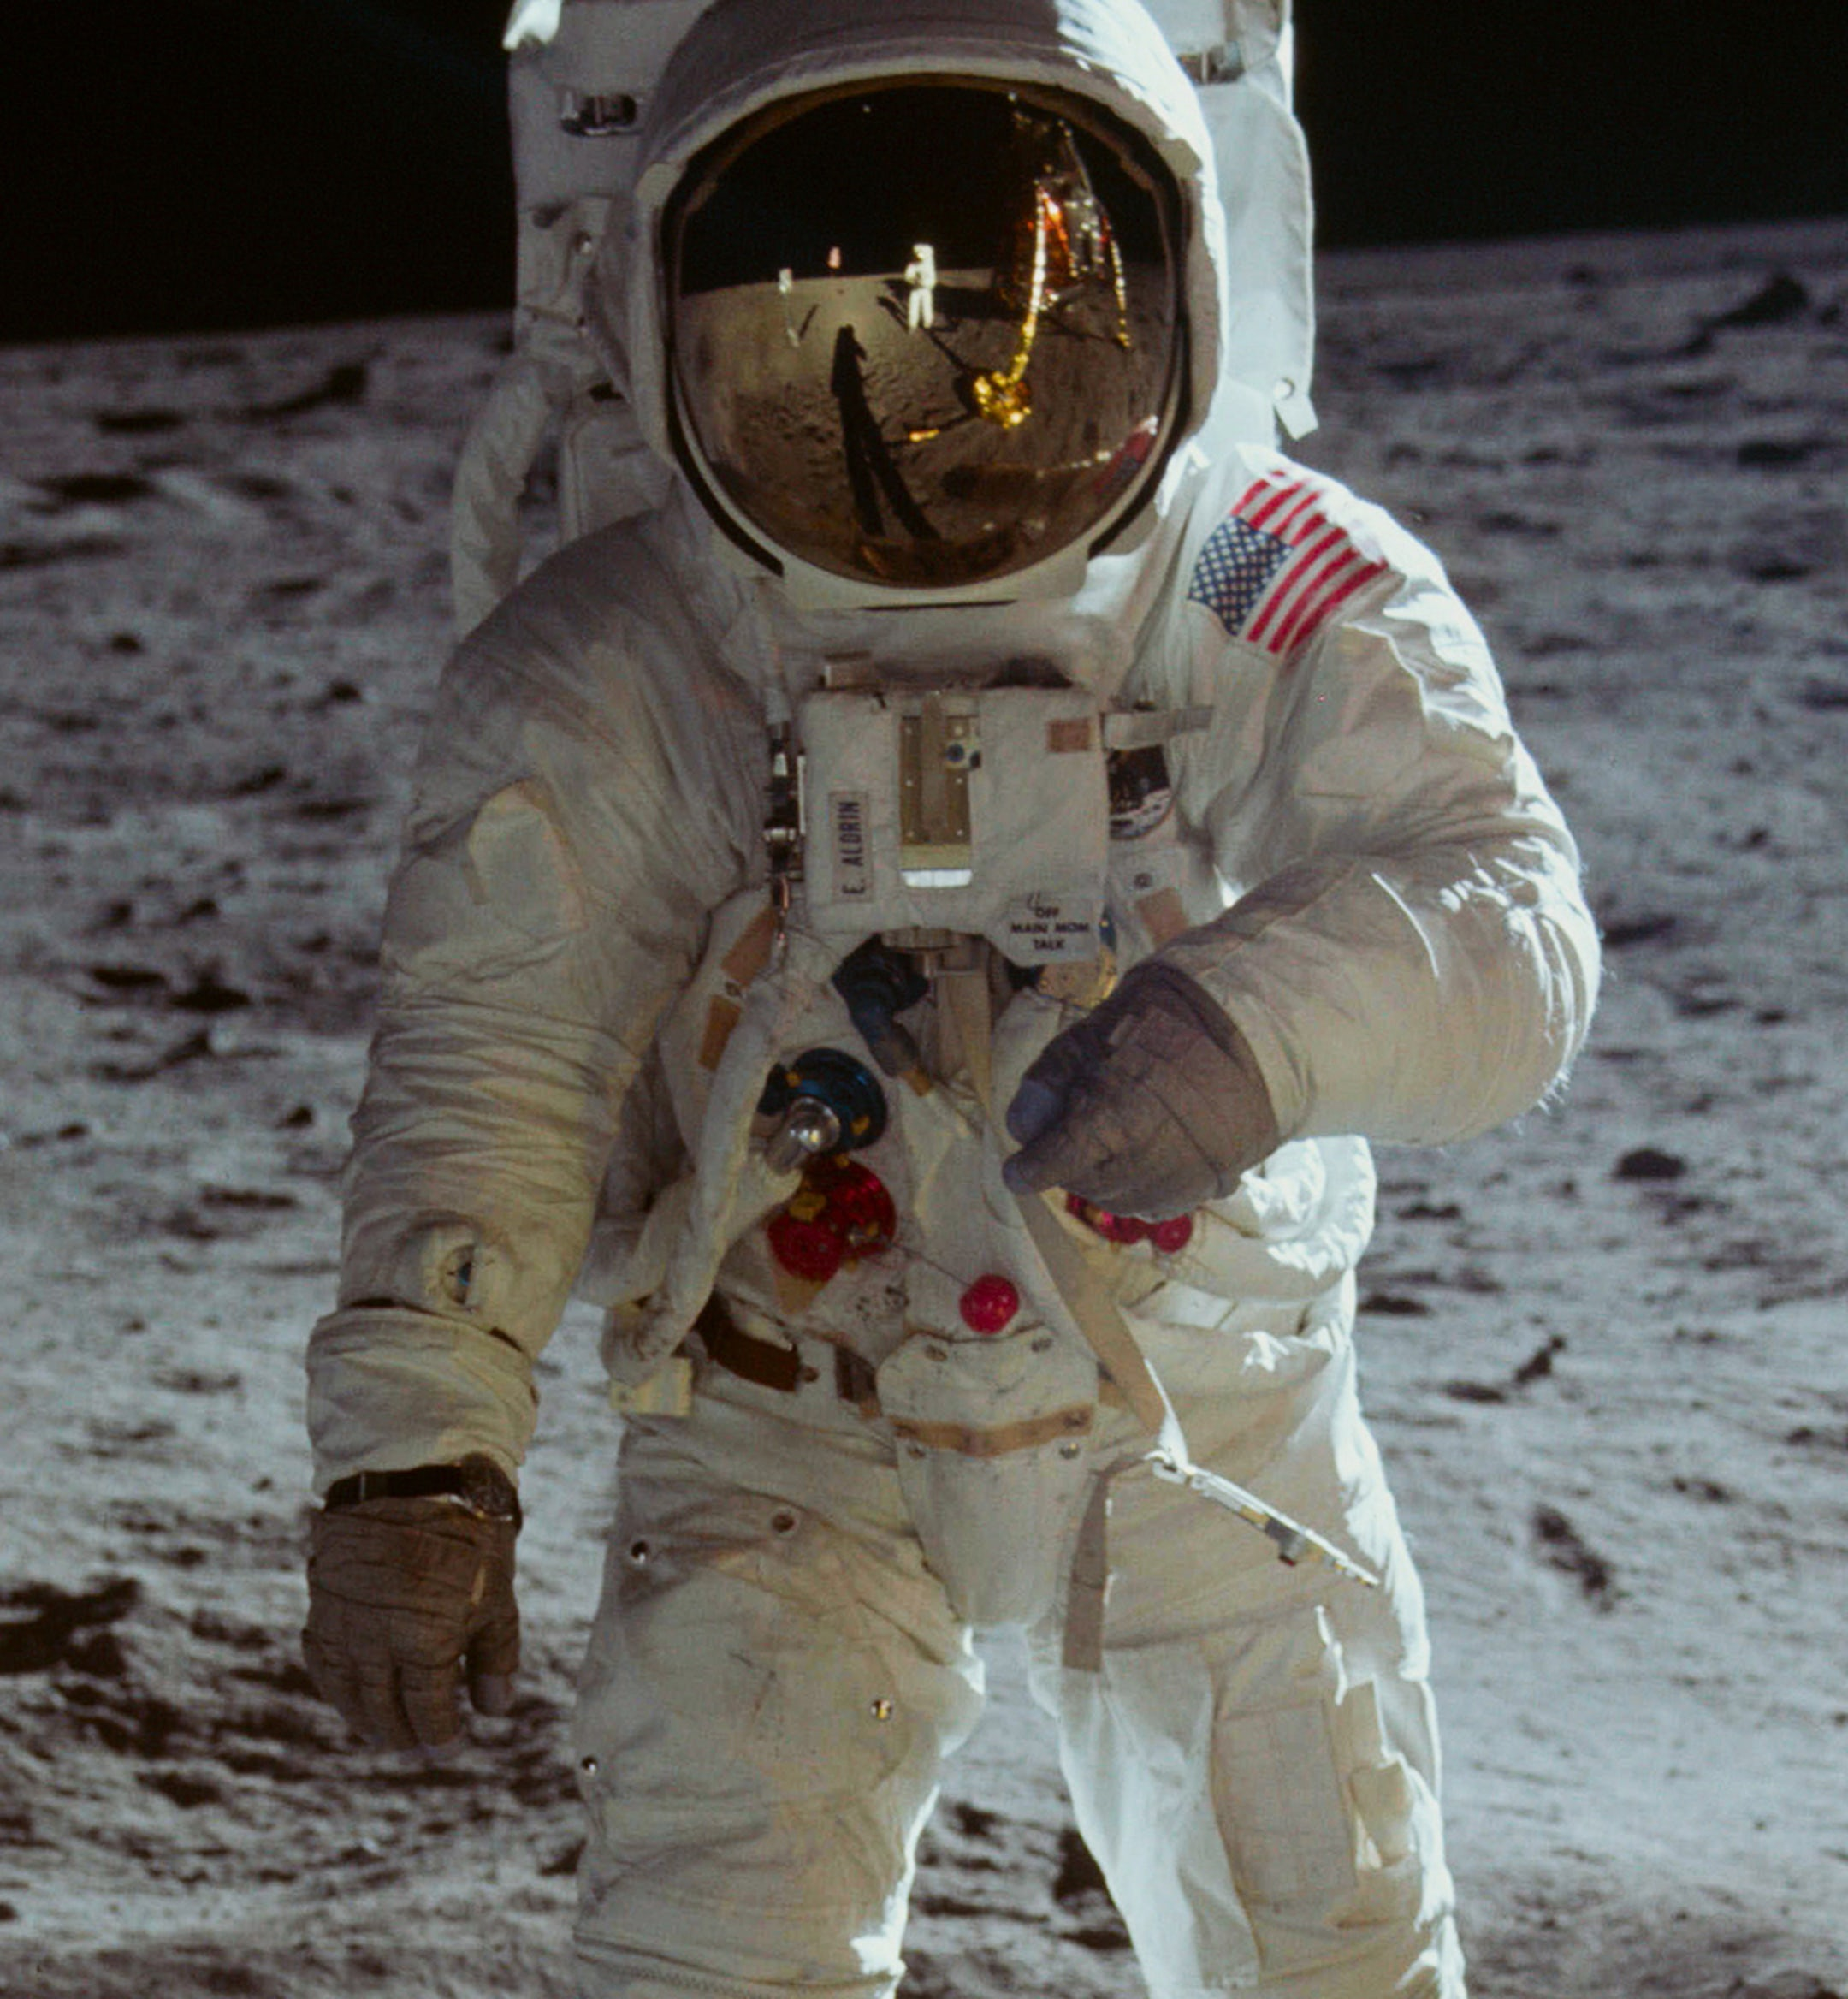 Apollo 11 mobile